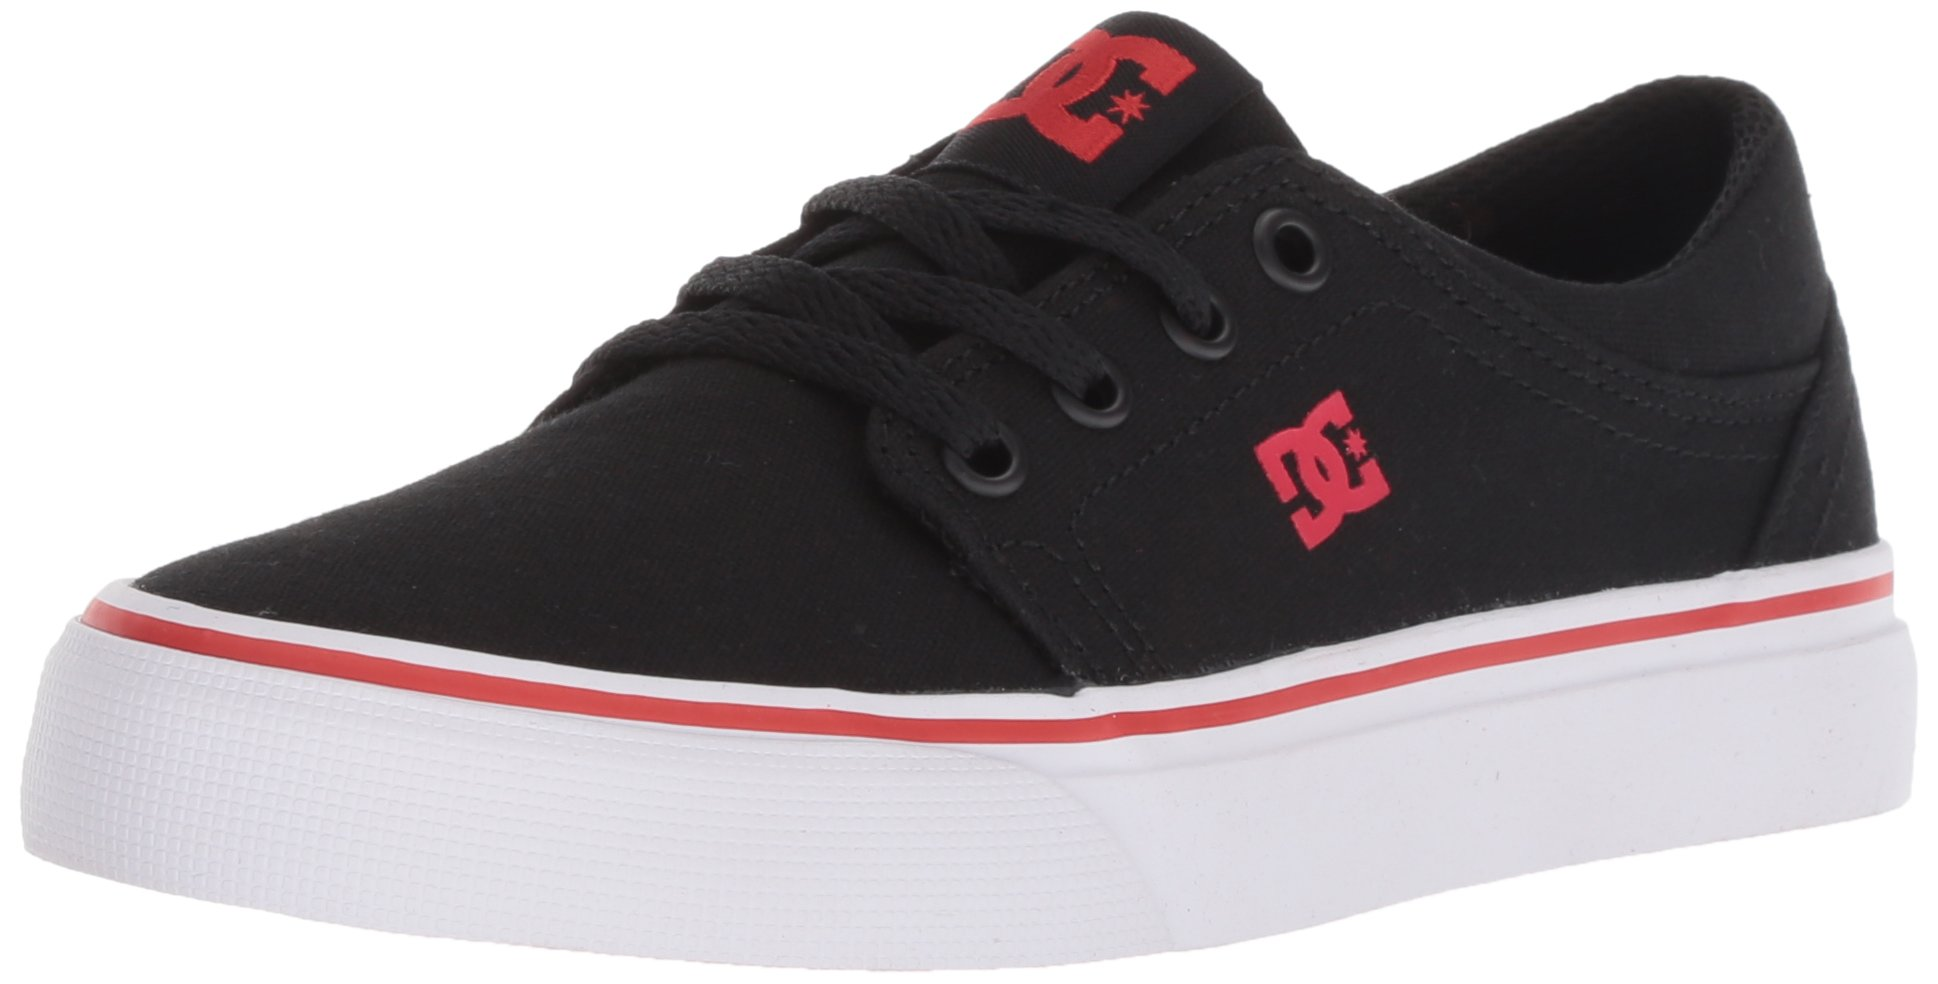 DC Boys' Trase TX Skate Shoe, Black/Athletic RED, 13.5 M US Little Kid